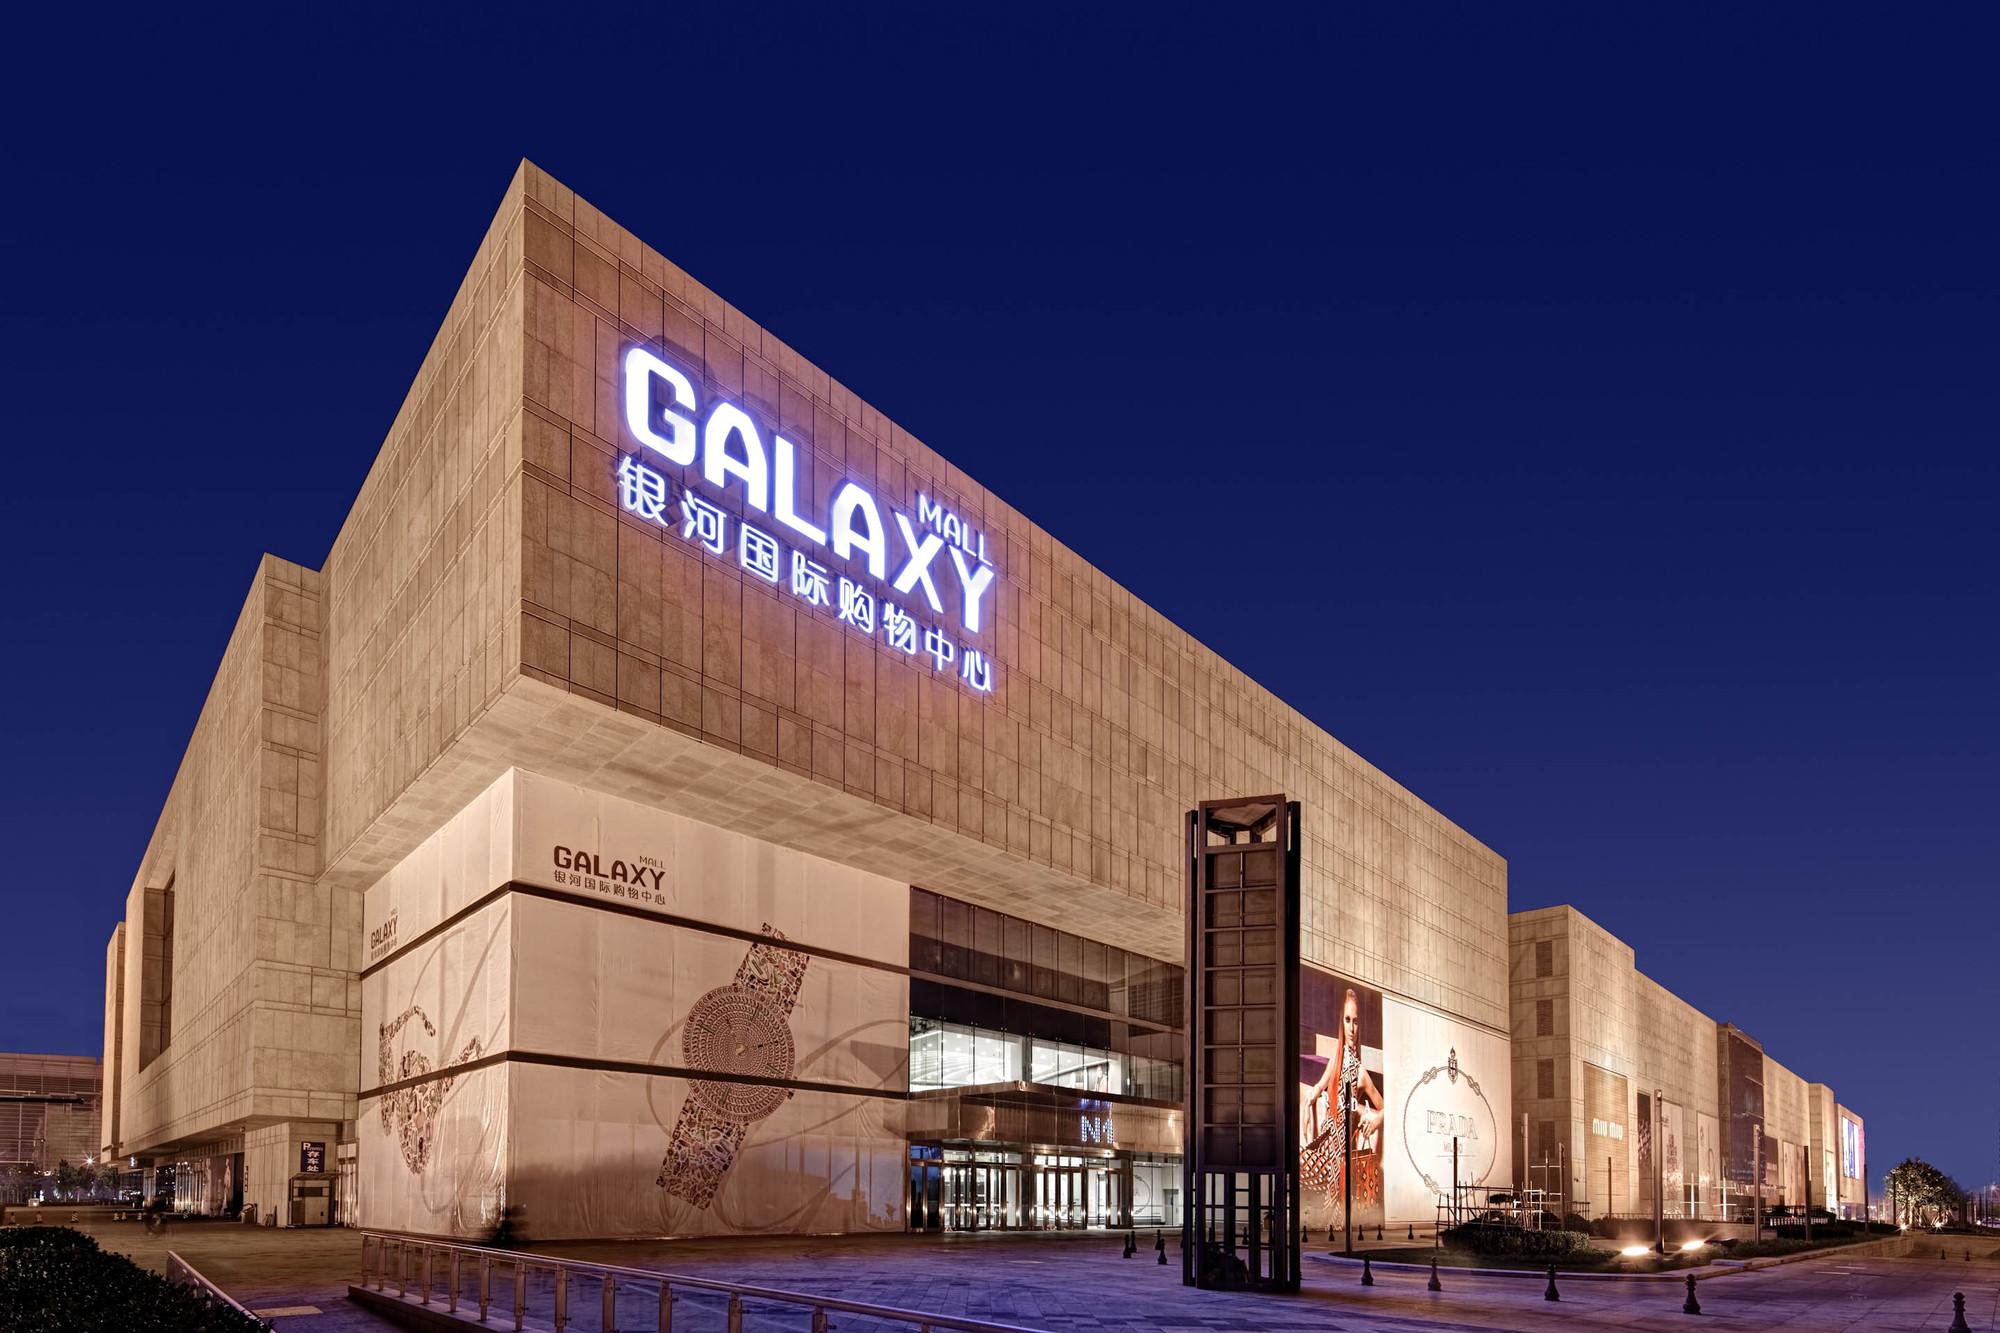 Galaxay Mall / tvsdesign, Courtesy of tvsdesign